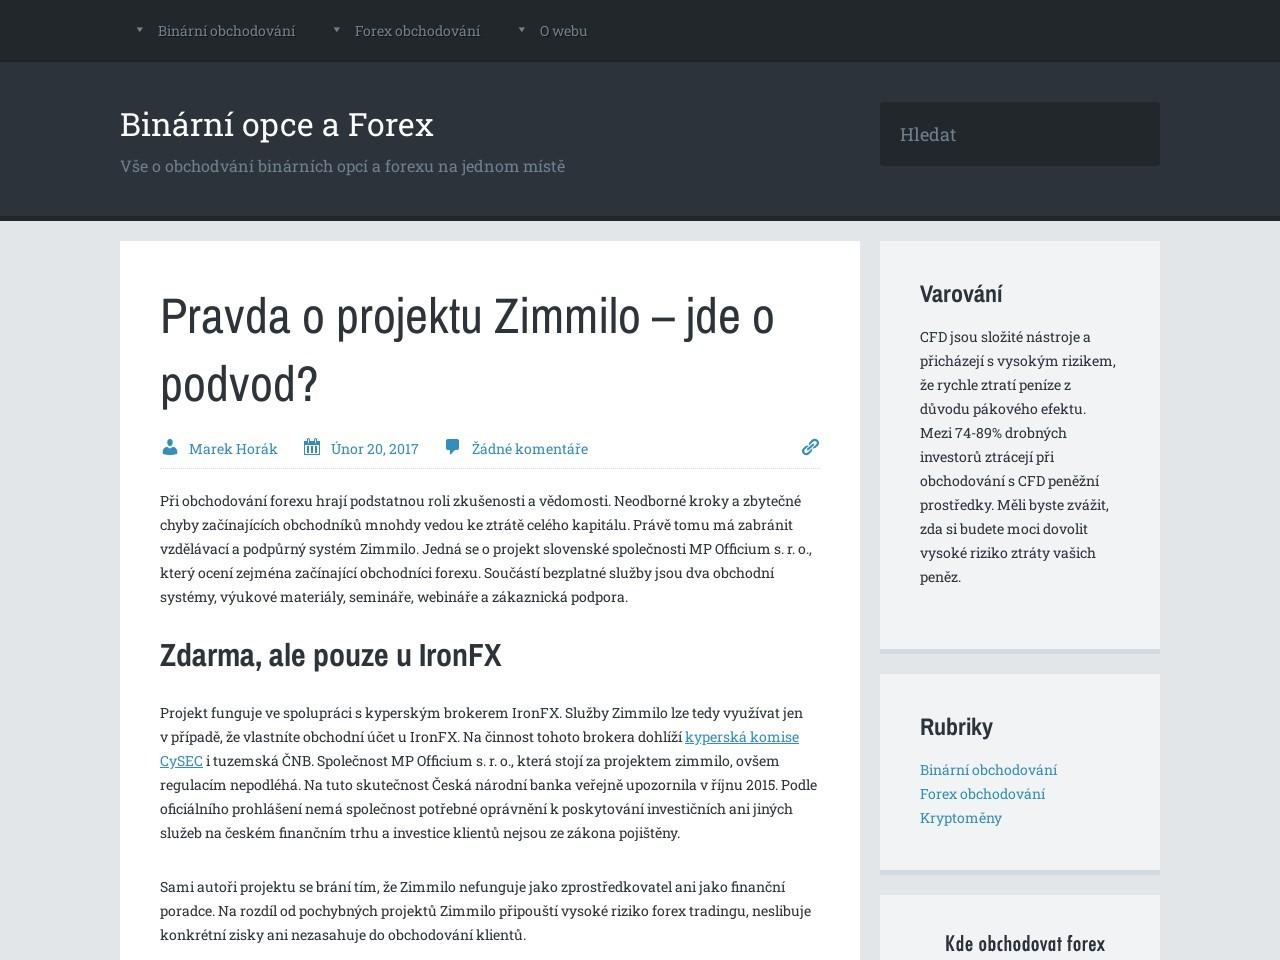 Pravda o projektu Zimmilo – jde o podvod? (Zdroj: Wordpress.com)